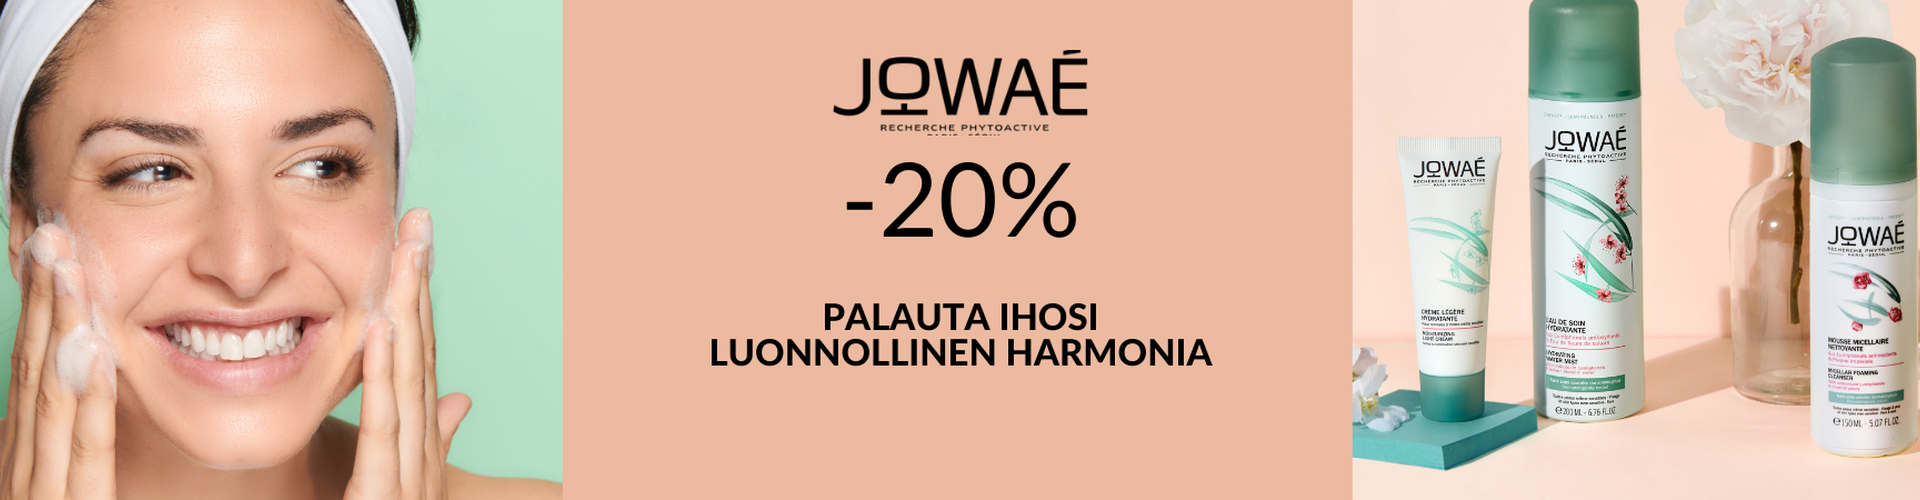 Jowae -20%